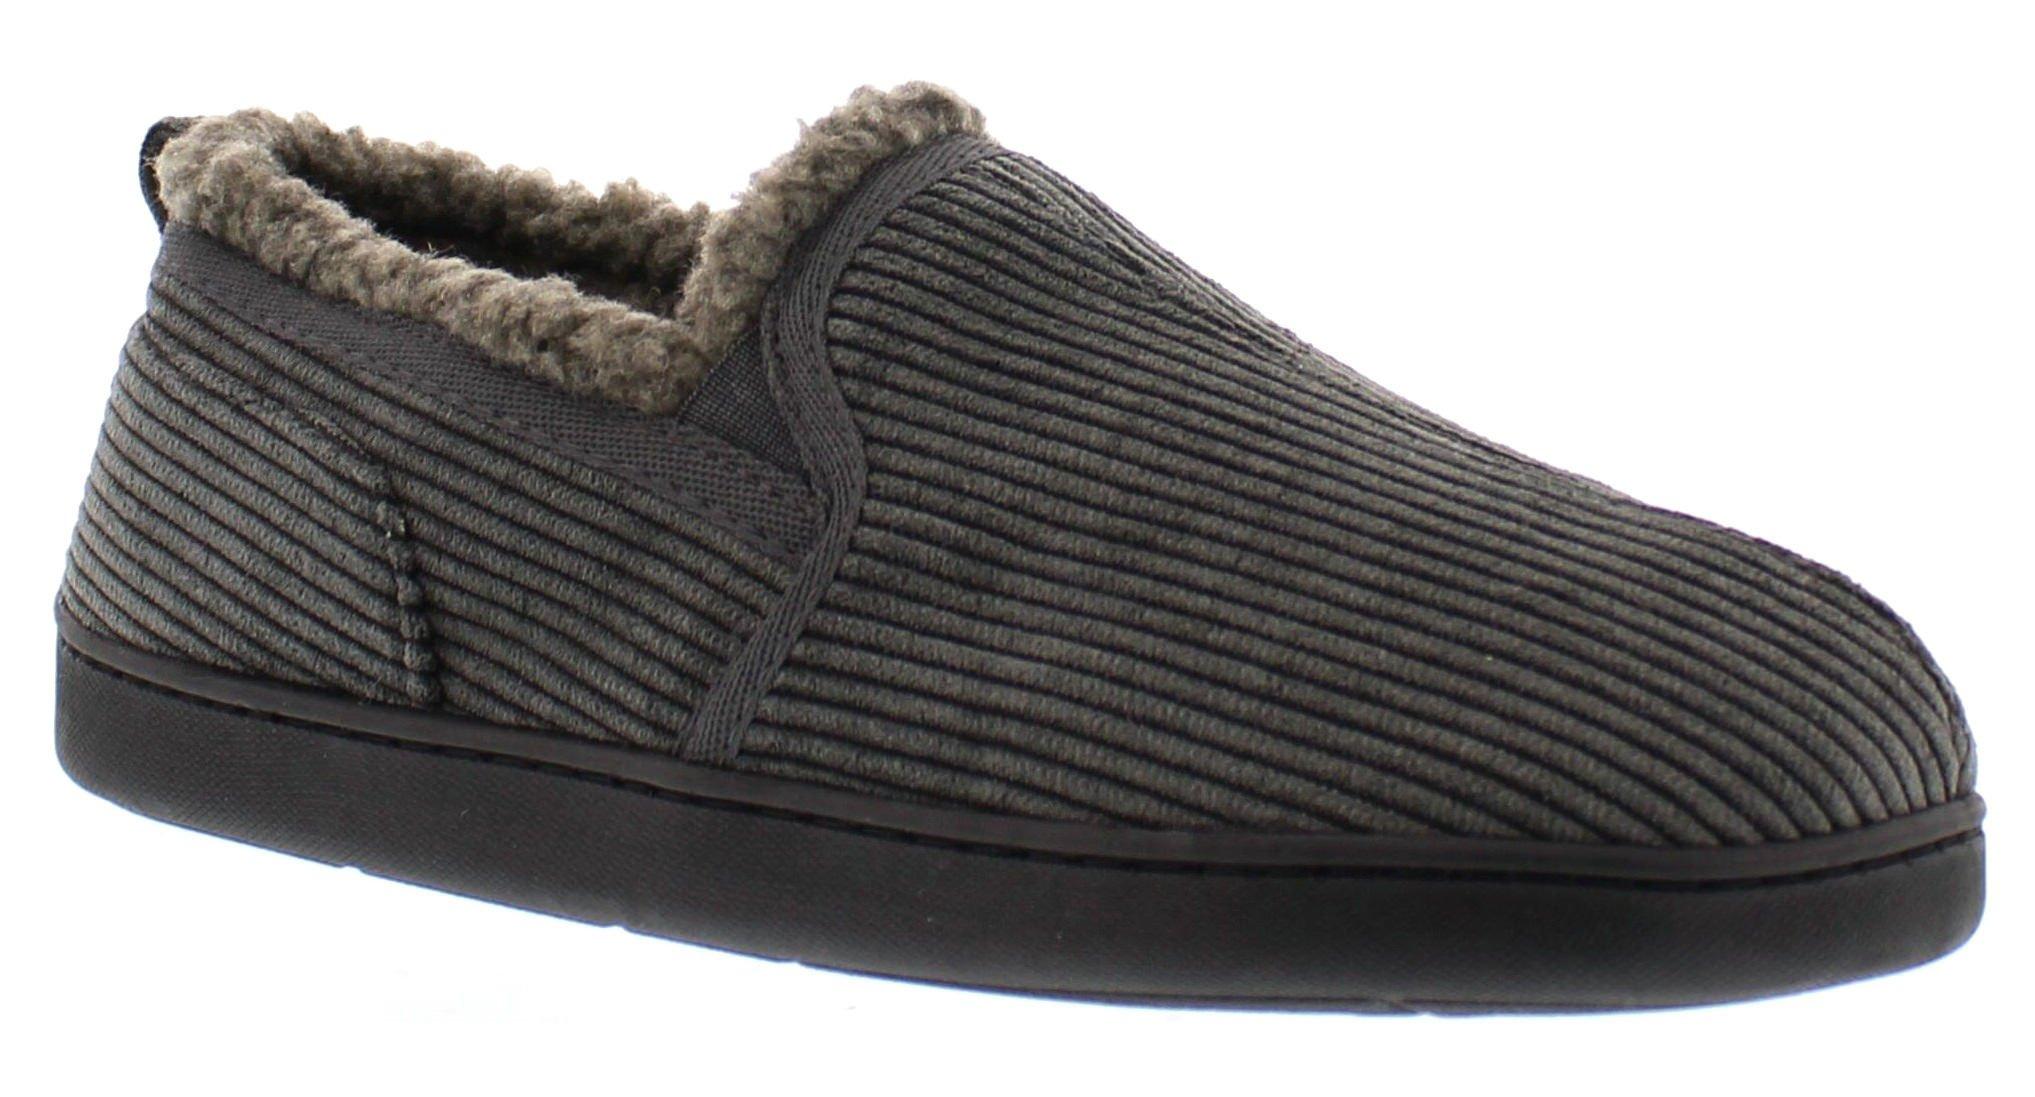 Gold Toe Men's Gordon Memory Foam Corduroy Slippers Sherpa Fleece Lined House Shoes Casual Slip On Loafer Grey 9 US